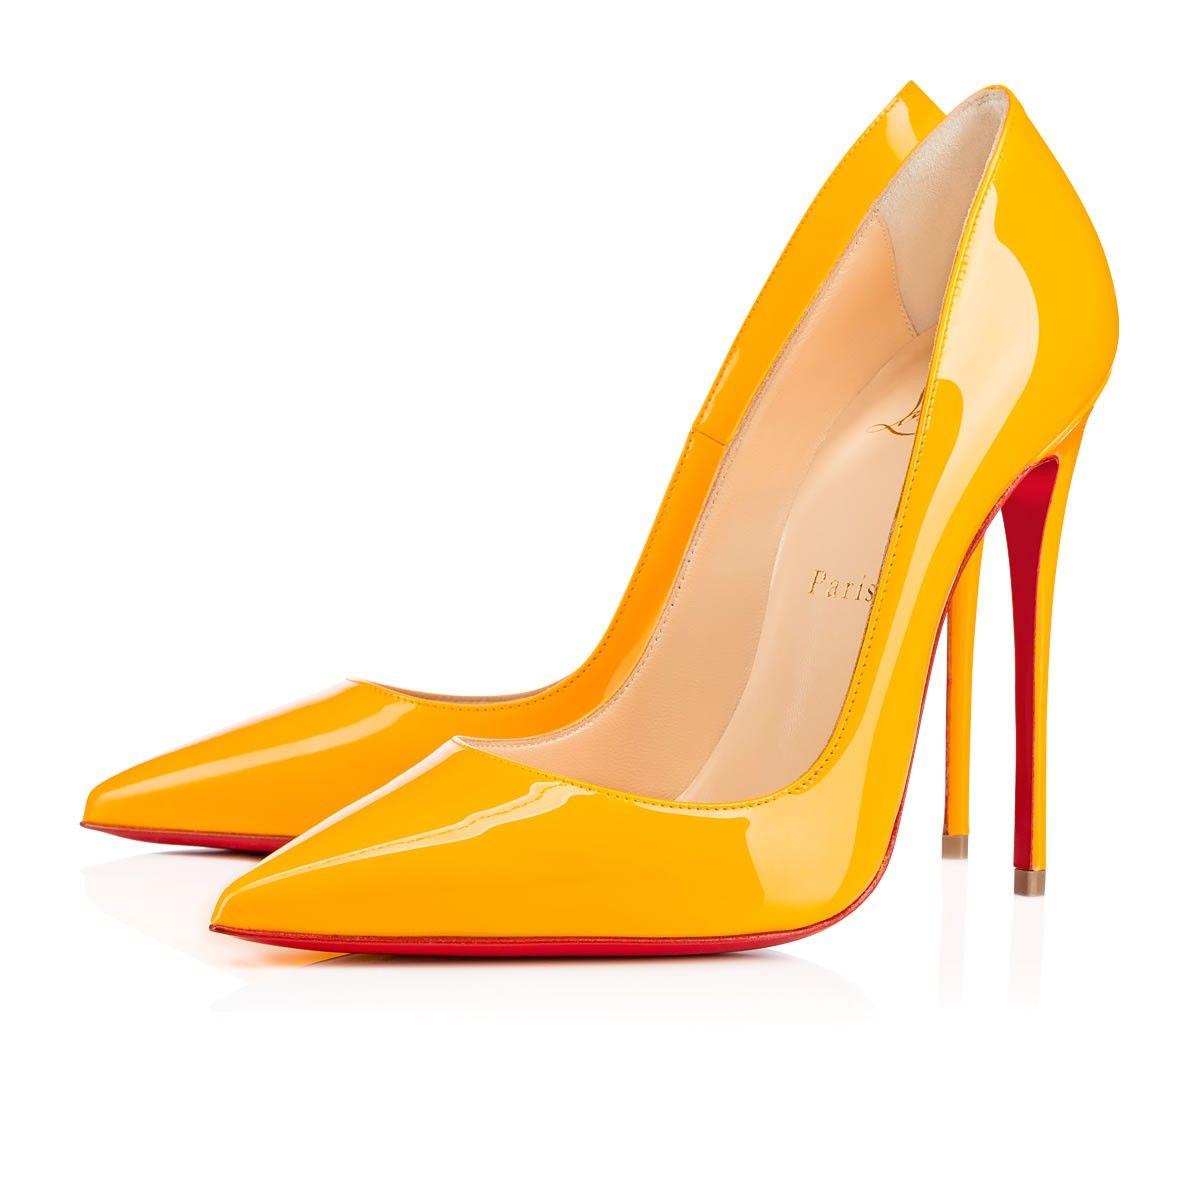 25177d564a5f CHRISTIAN LOUBOUTIN SO KATE PATENT 120 Full Moon Patent calfskin - Women  Shoes - Christian Louboutin.  christianlouboutin  shoes